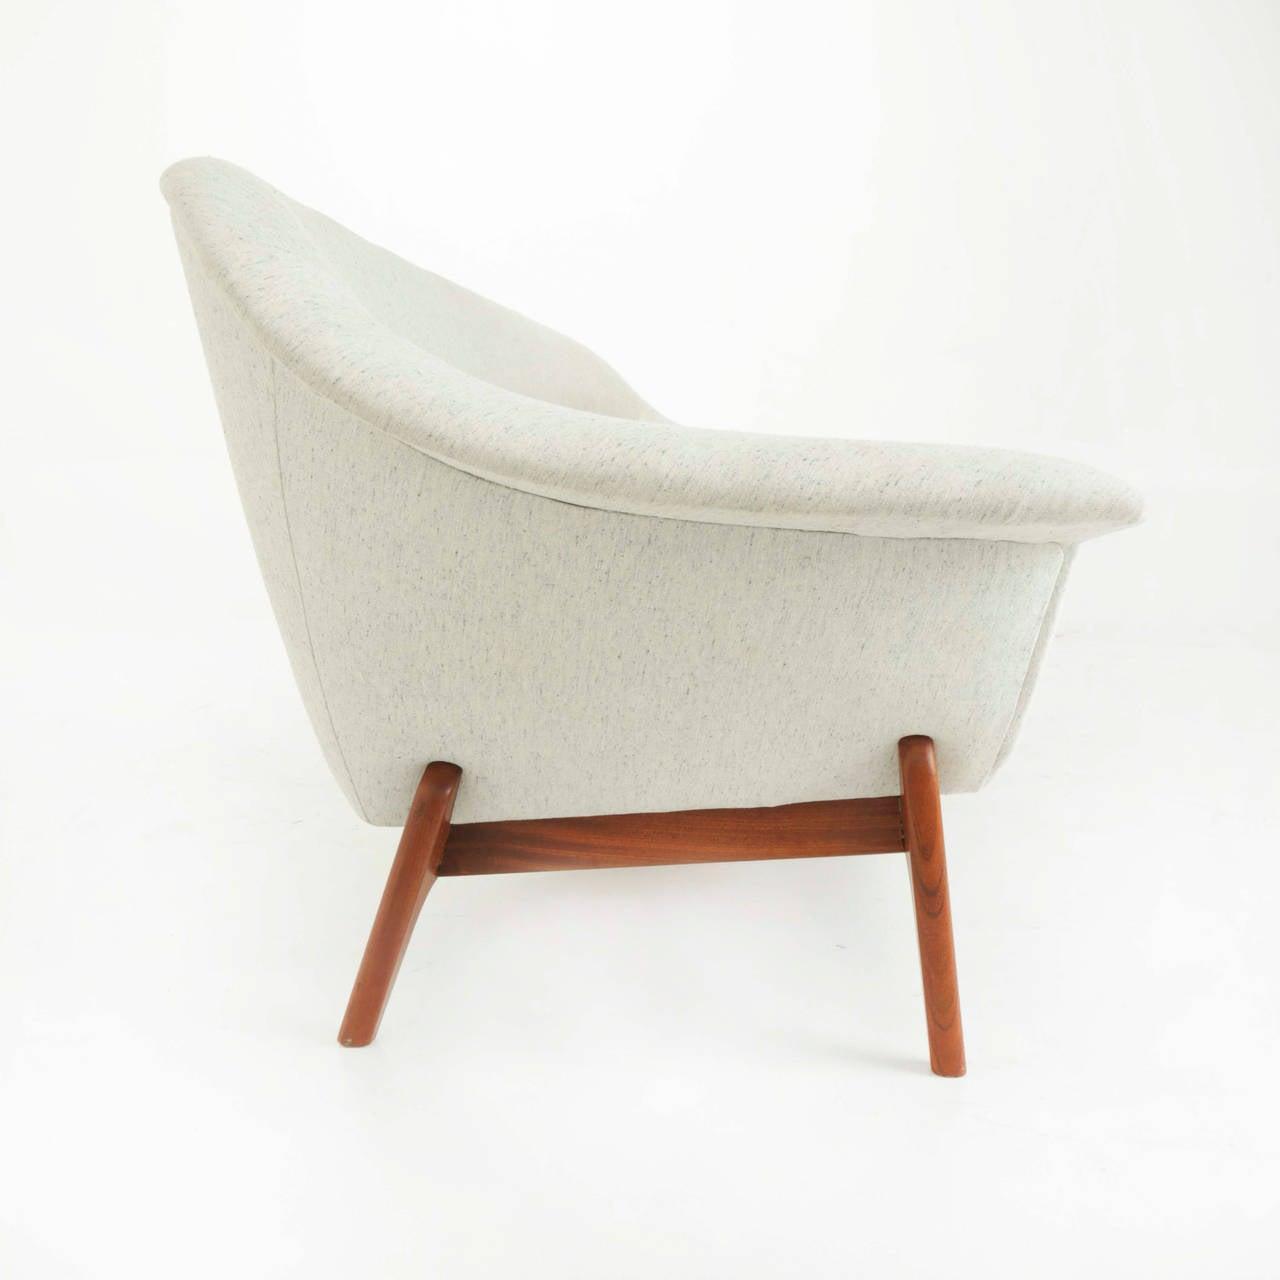 Rare Norwegian Teak and Fabric Sofa Rastad & Relling as Attribution 3